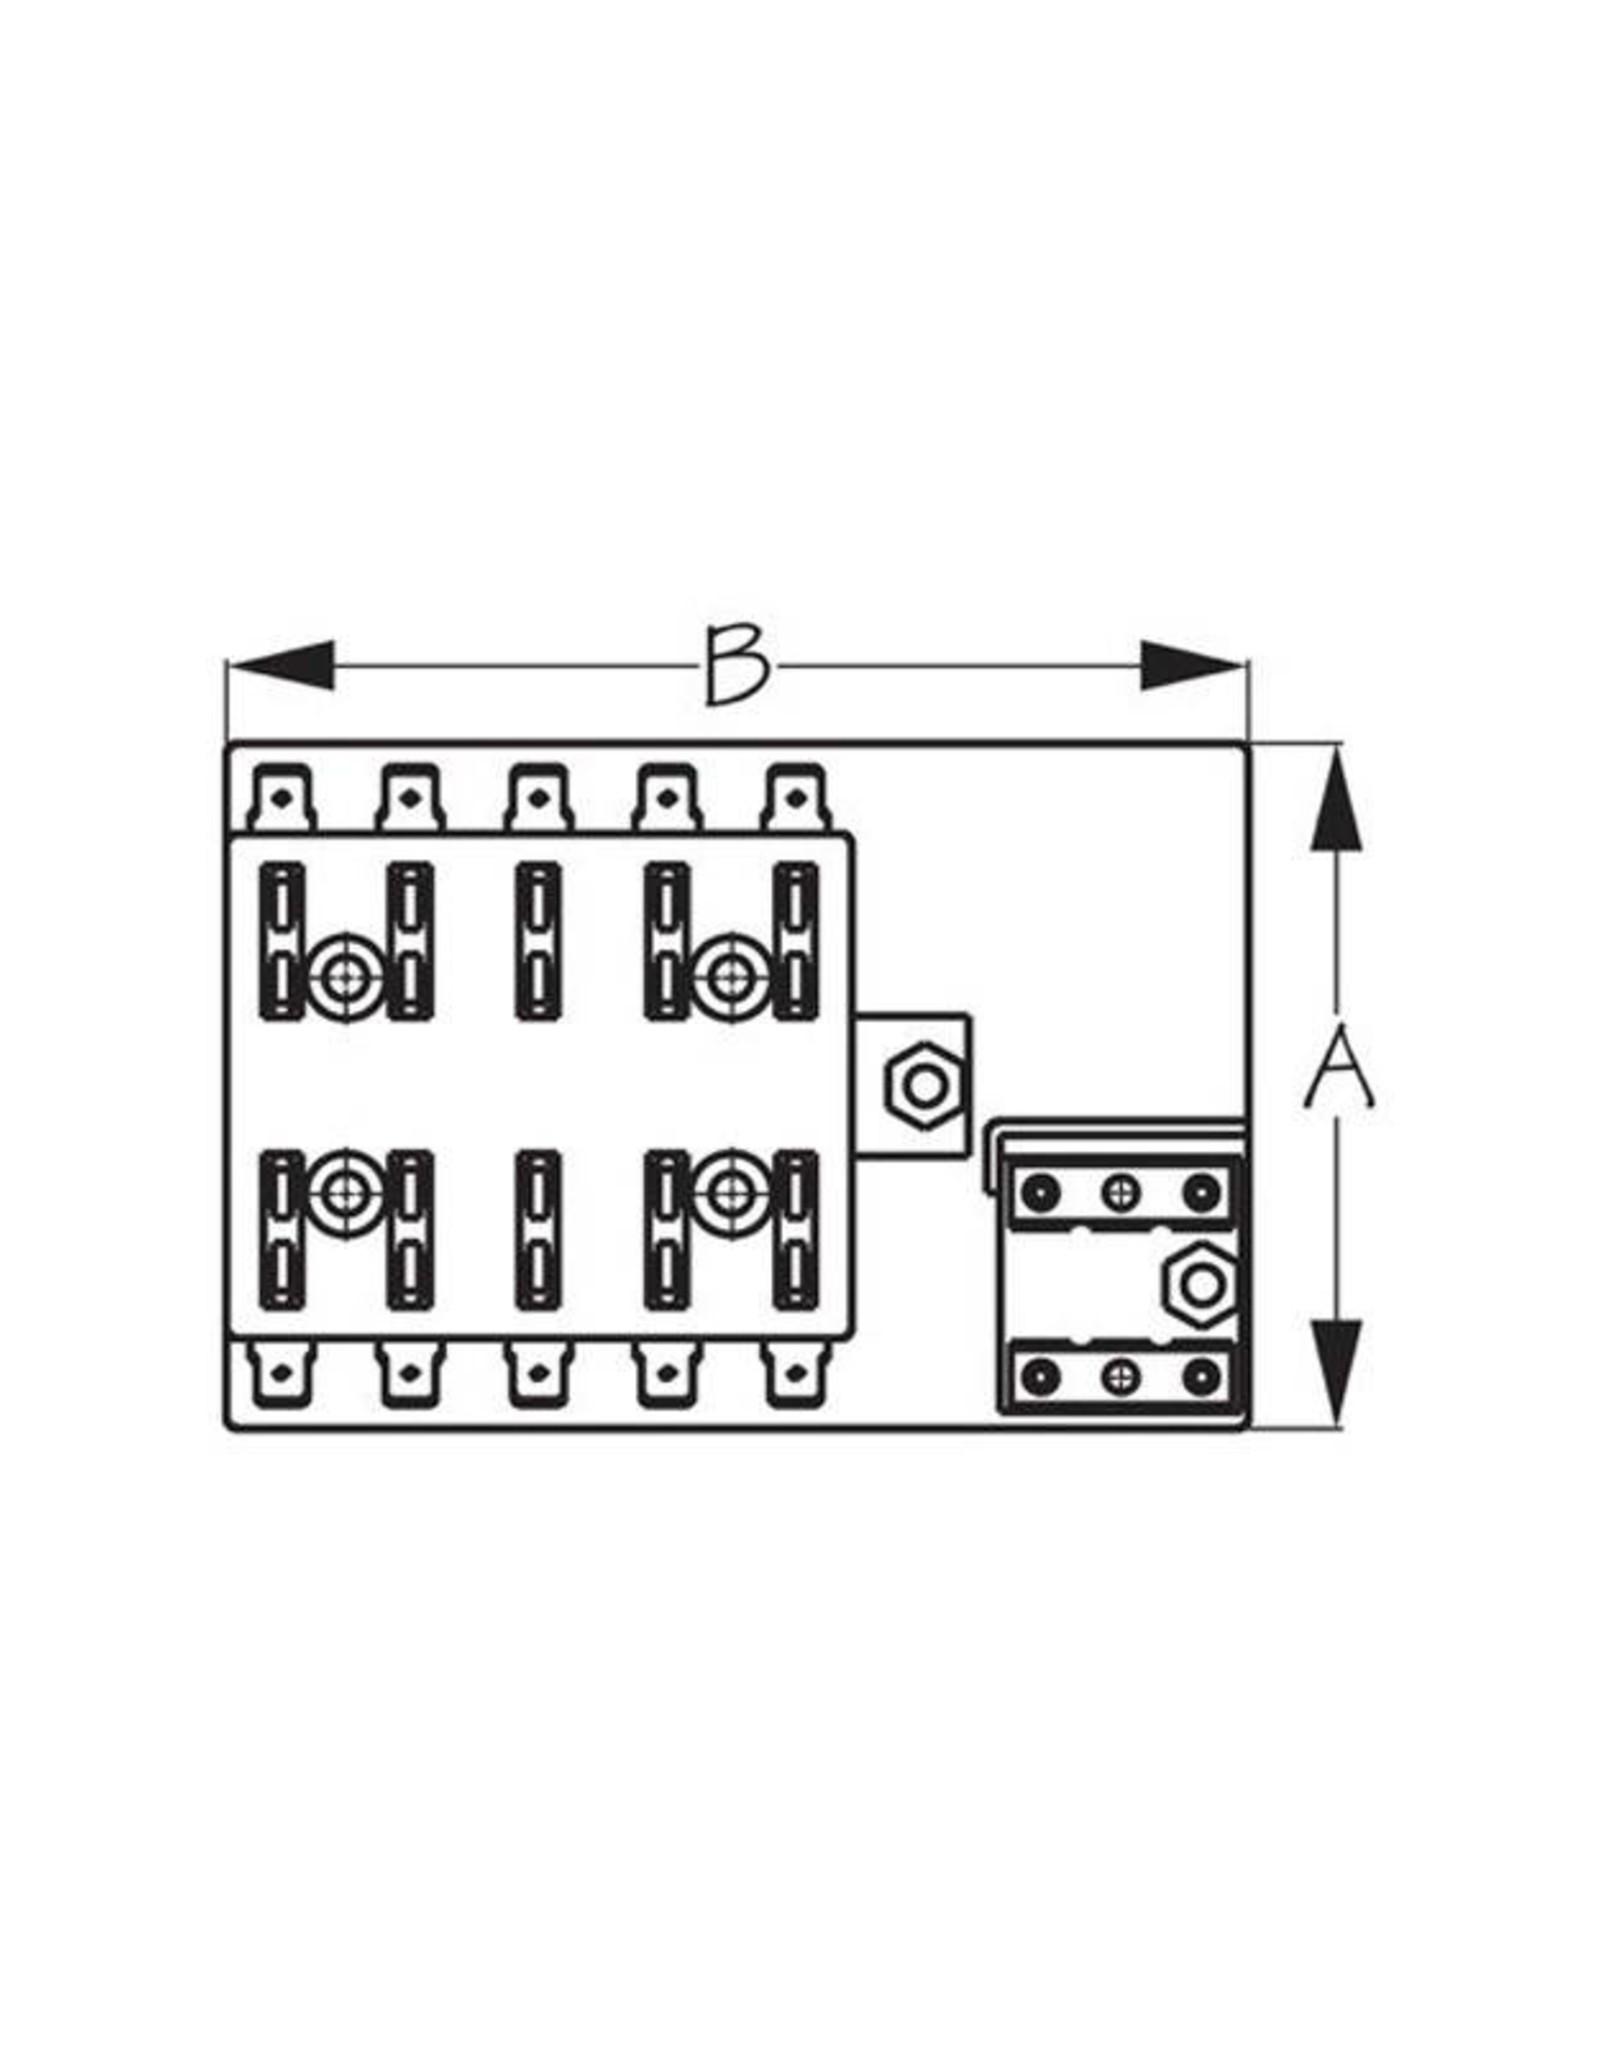 SEADOGLINE 19   445191-1 ATC Style Fuse Block w/Ground